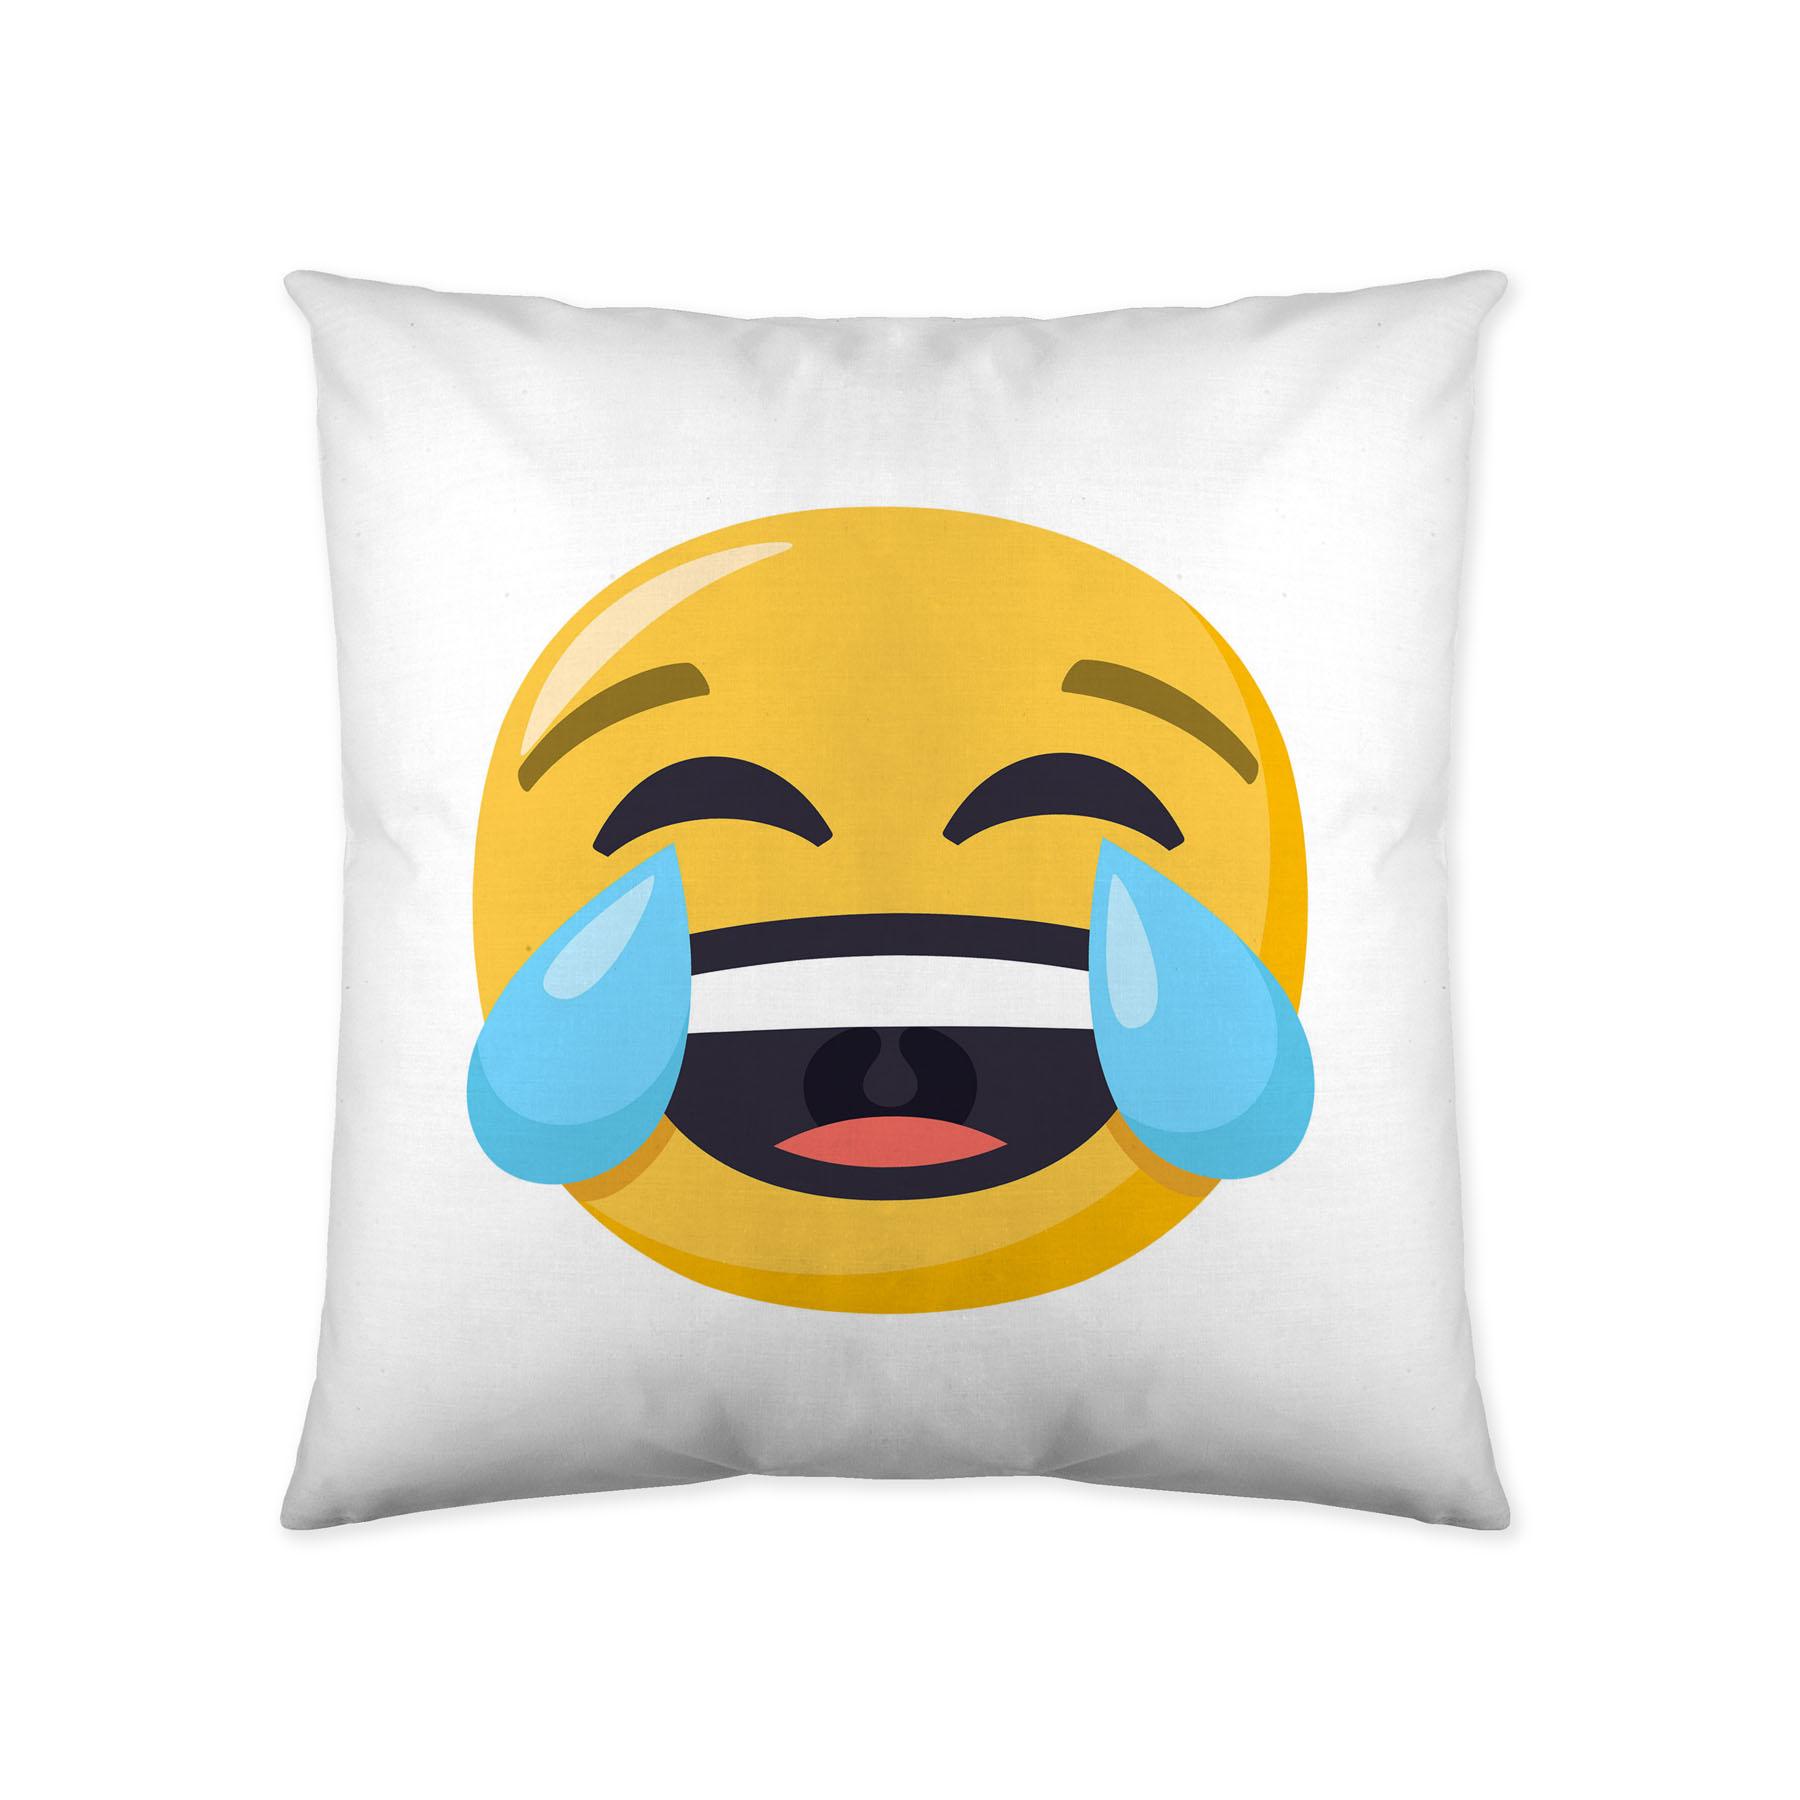 COJIN REVERSIBLE 1 JOY PIXELS EmojiOne 40 x 40 cms con relleno